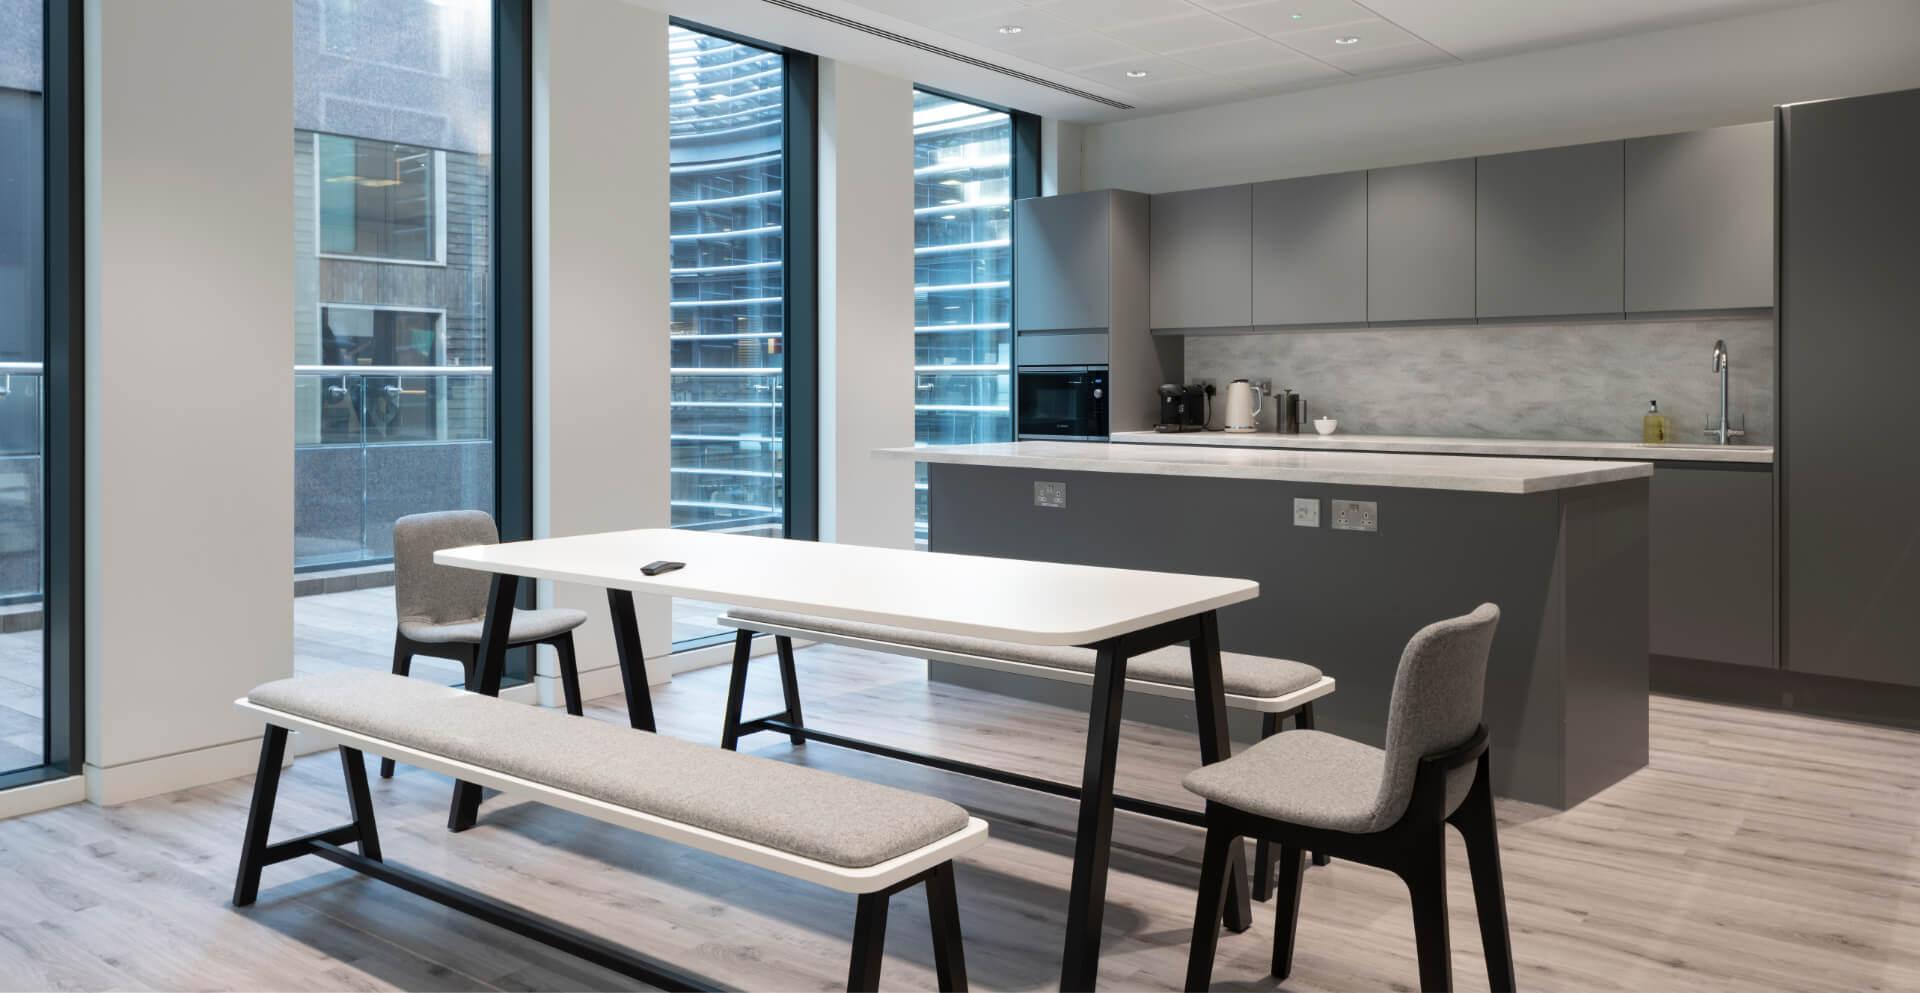 Avior Office Kitchen